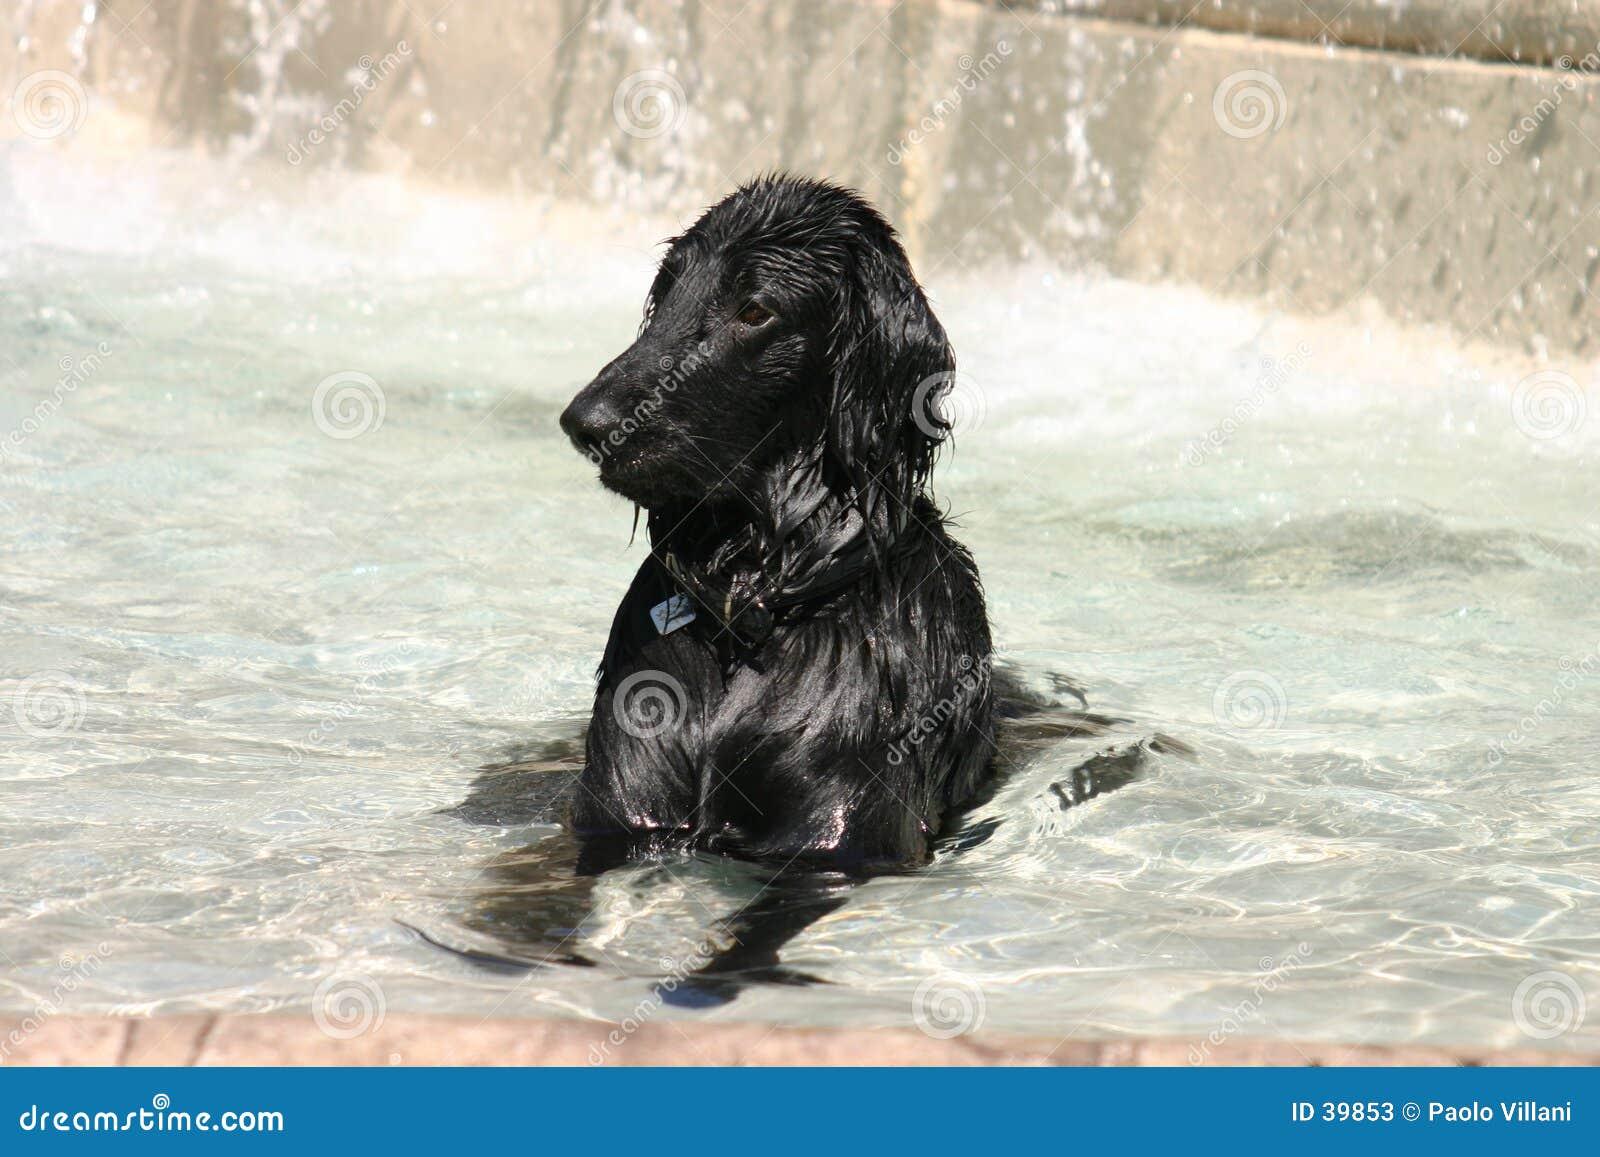 Zwarte hond die in een fontein wordt ondergedompeld